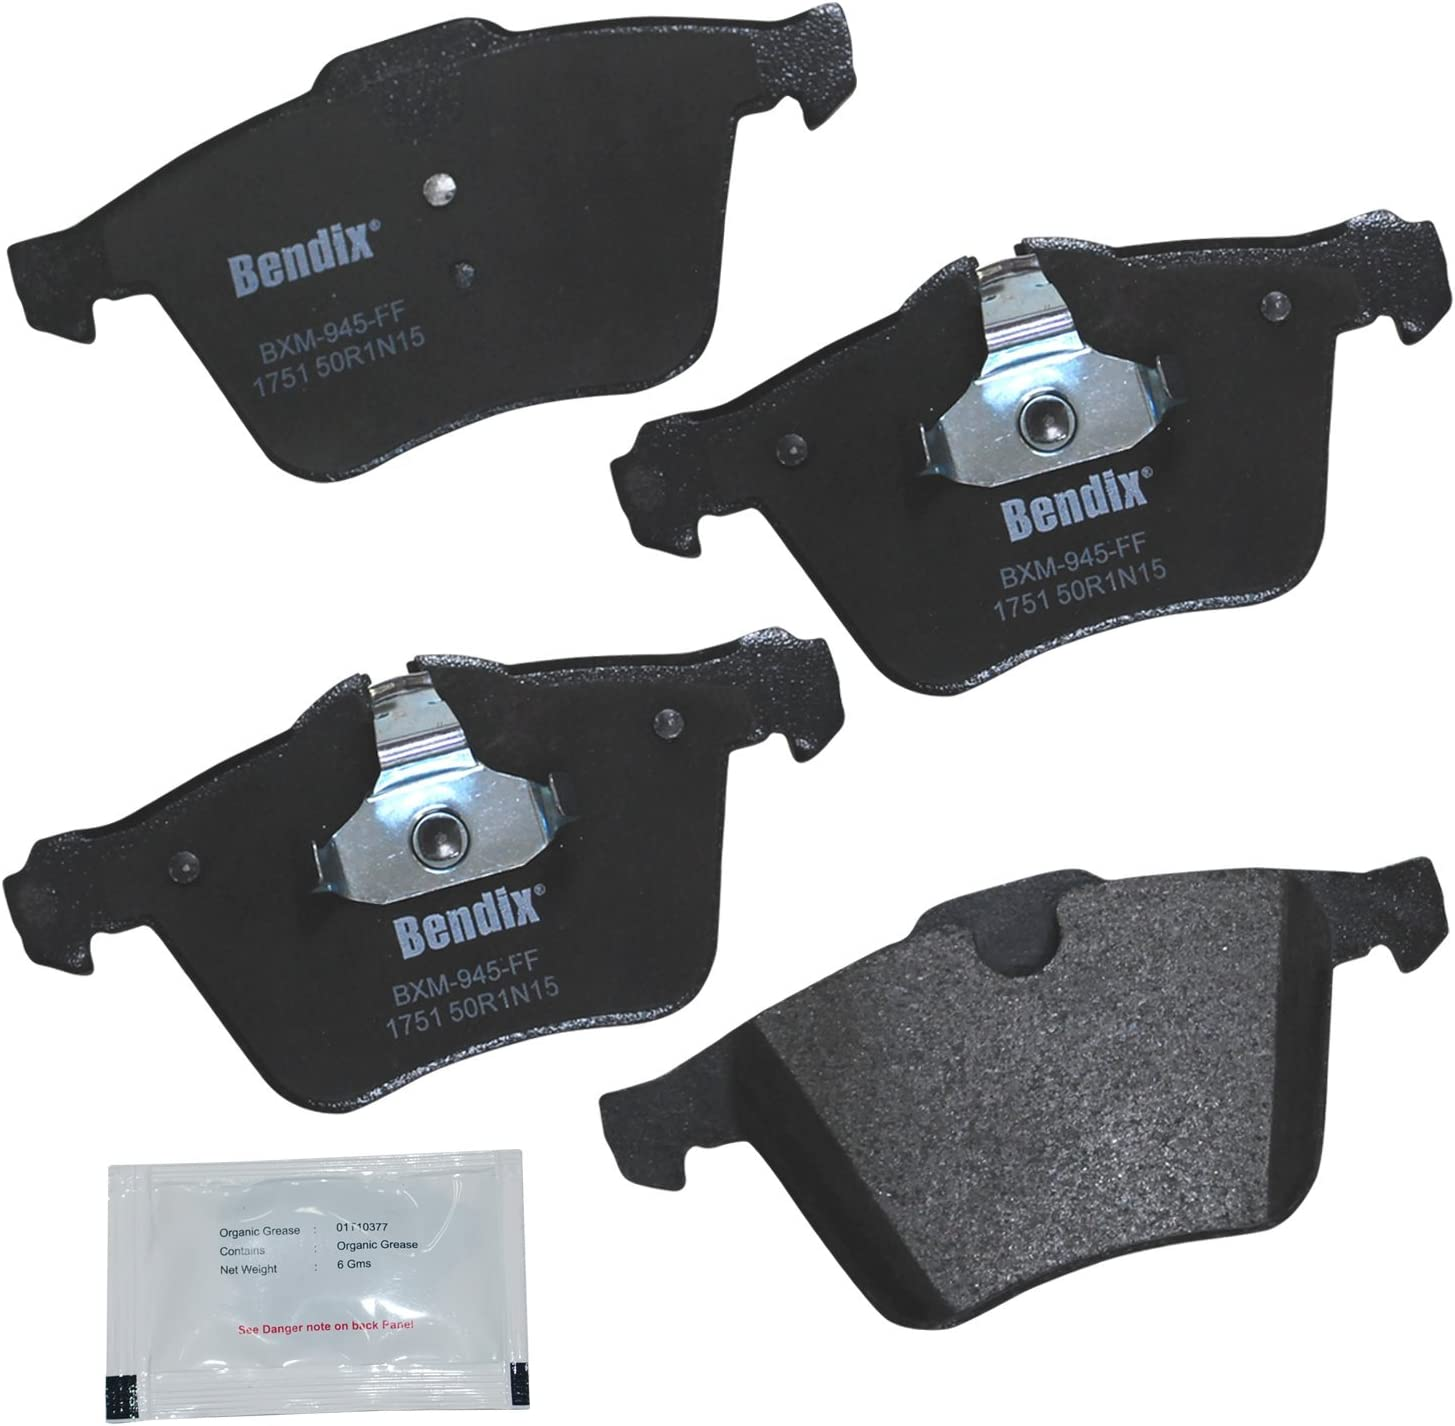 Bendix Premium Copper Free CFM1646 Premium Copper Free Semi-Metallic Brake Pad Rear